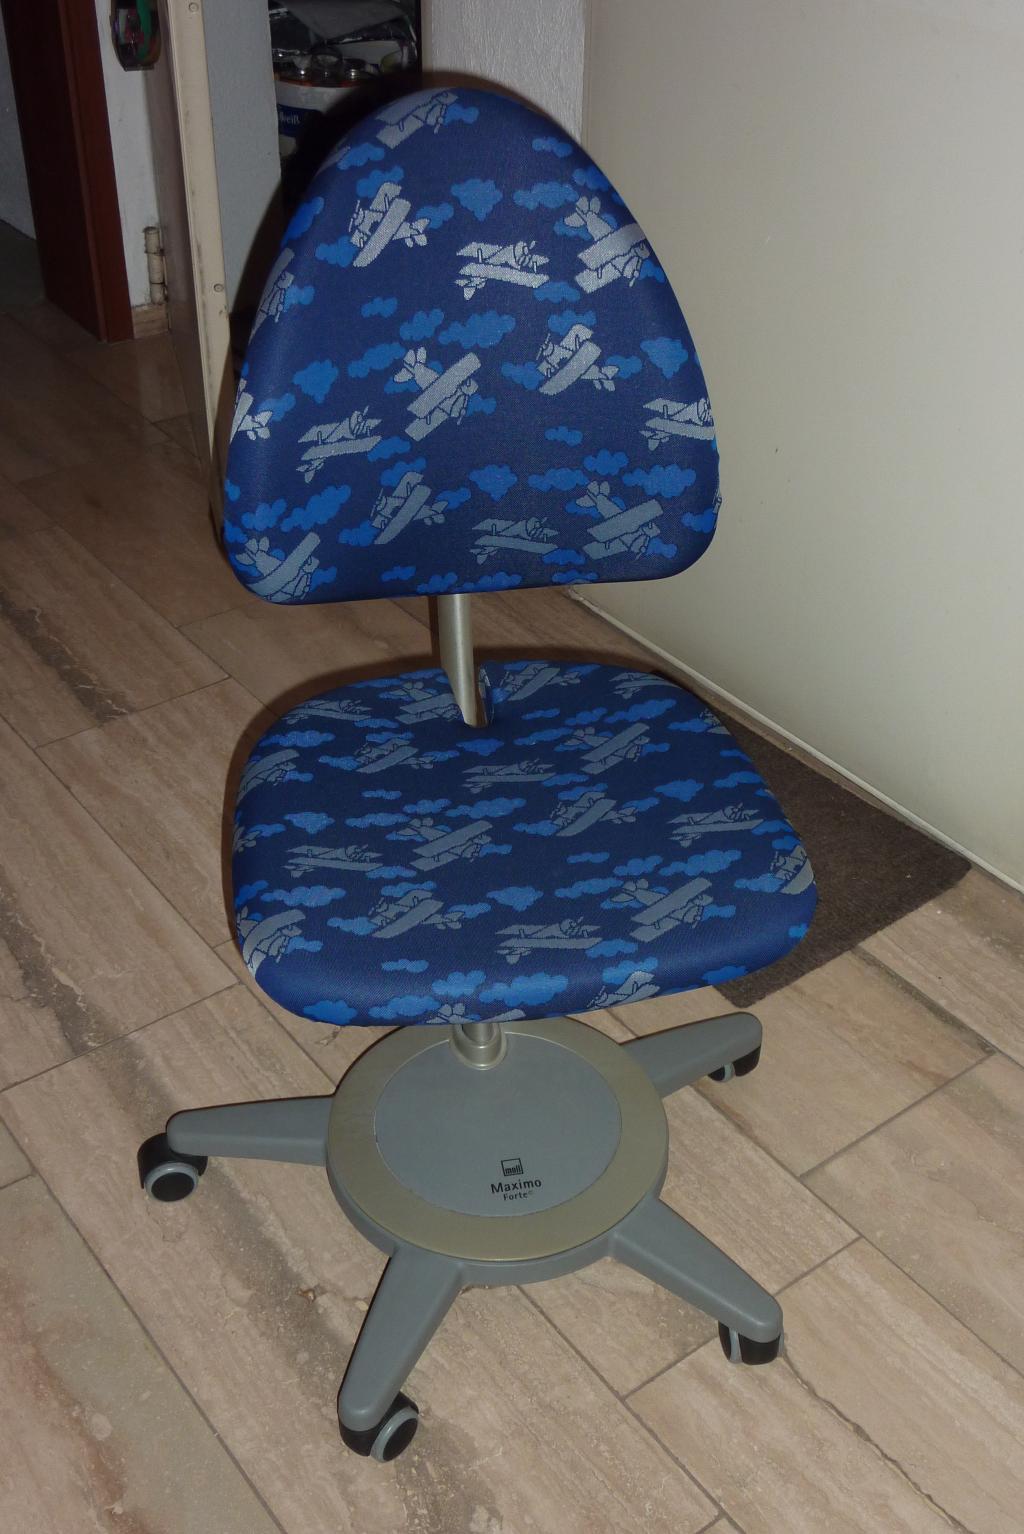 Moll Schreibtischstuhl Drehstuhl Maximo Forte Metallic Bezug Pilot Blau Mit Silbernen Flugzeugen